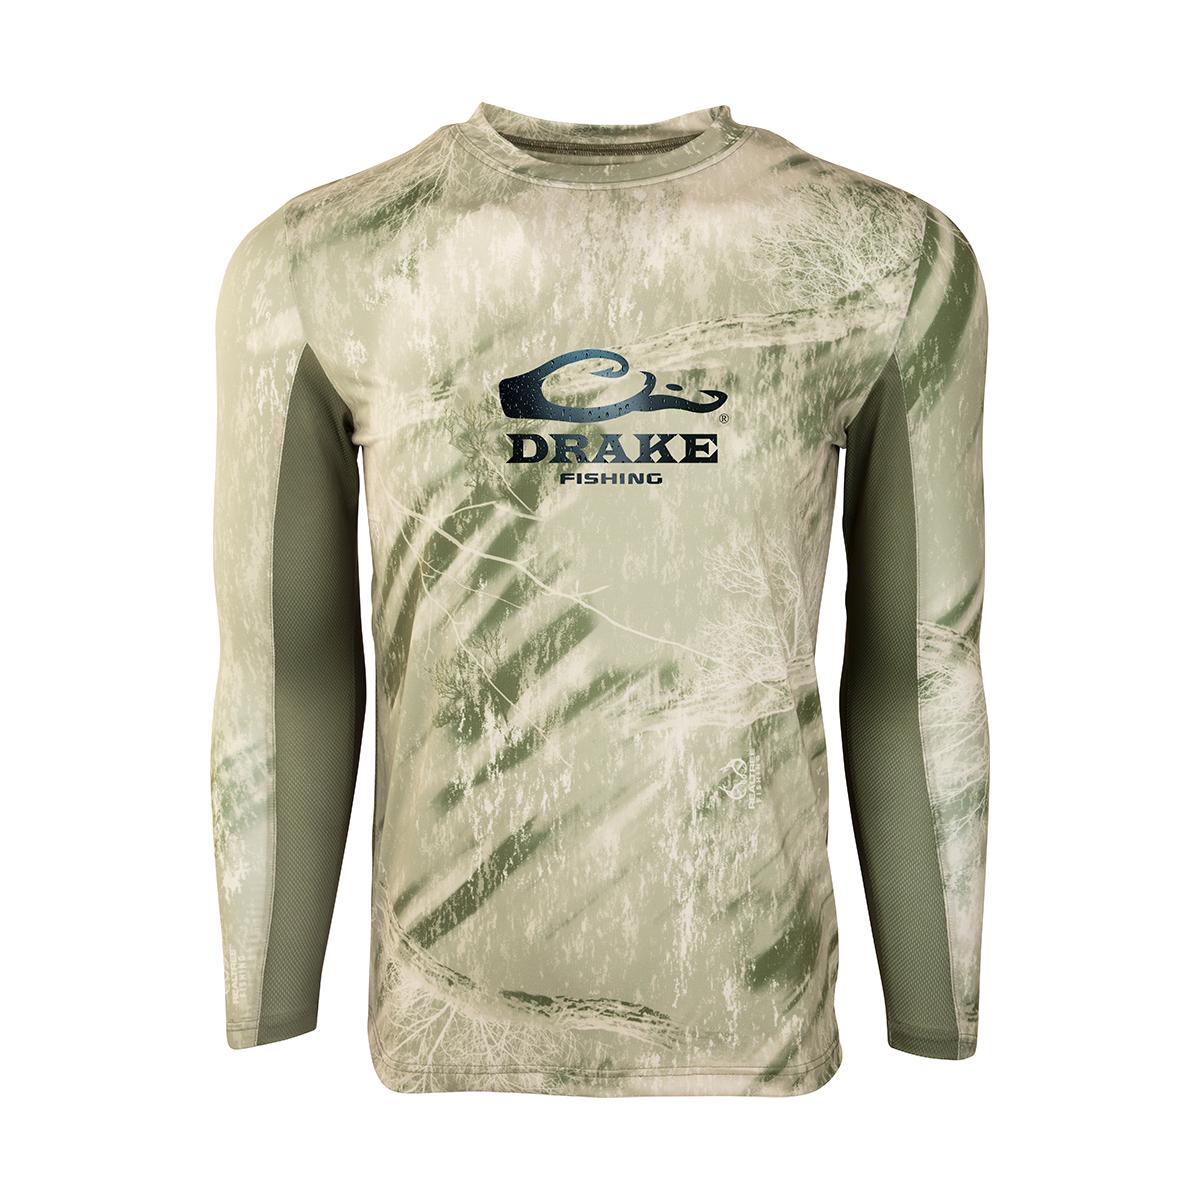 drake-performance-fish-big-tall-mesh-shirt-bigcamo-realtree-crappie